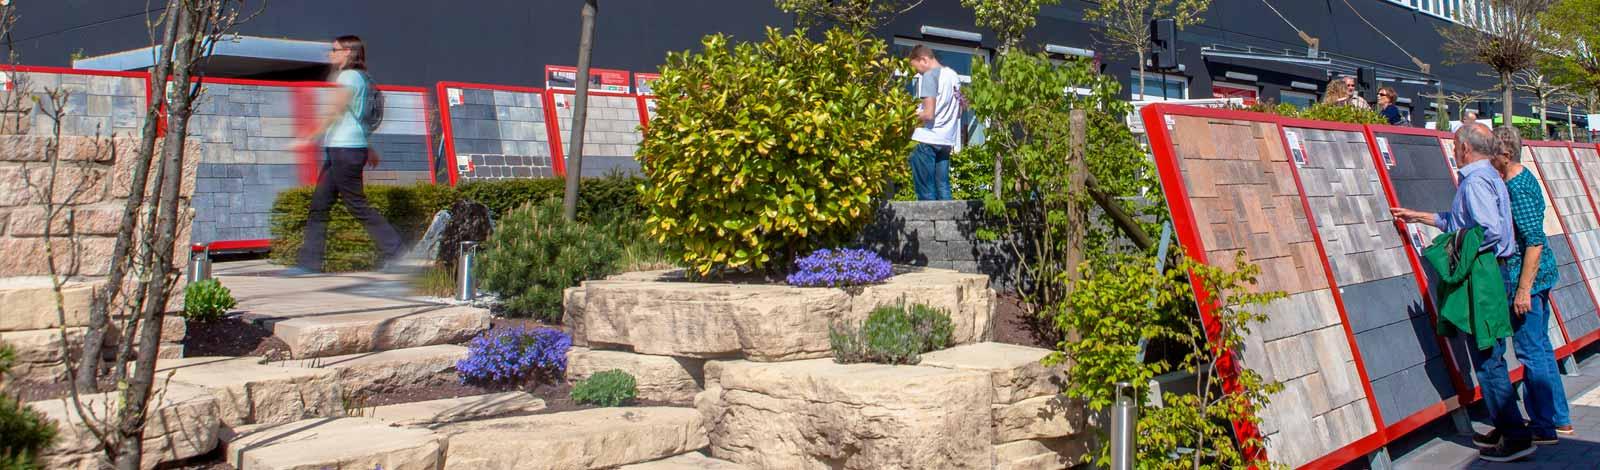 Gartenbau Langenfeld ideengärten koll steine